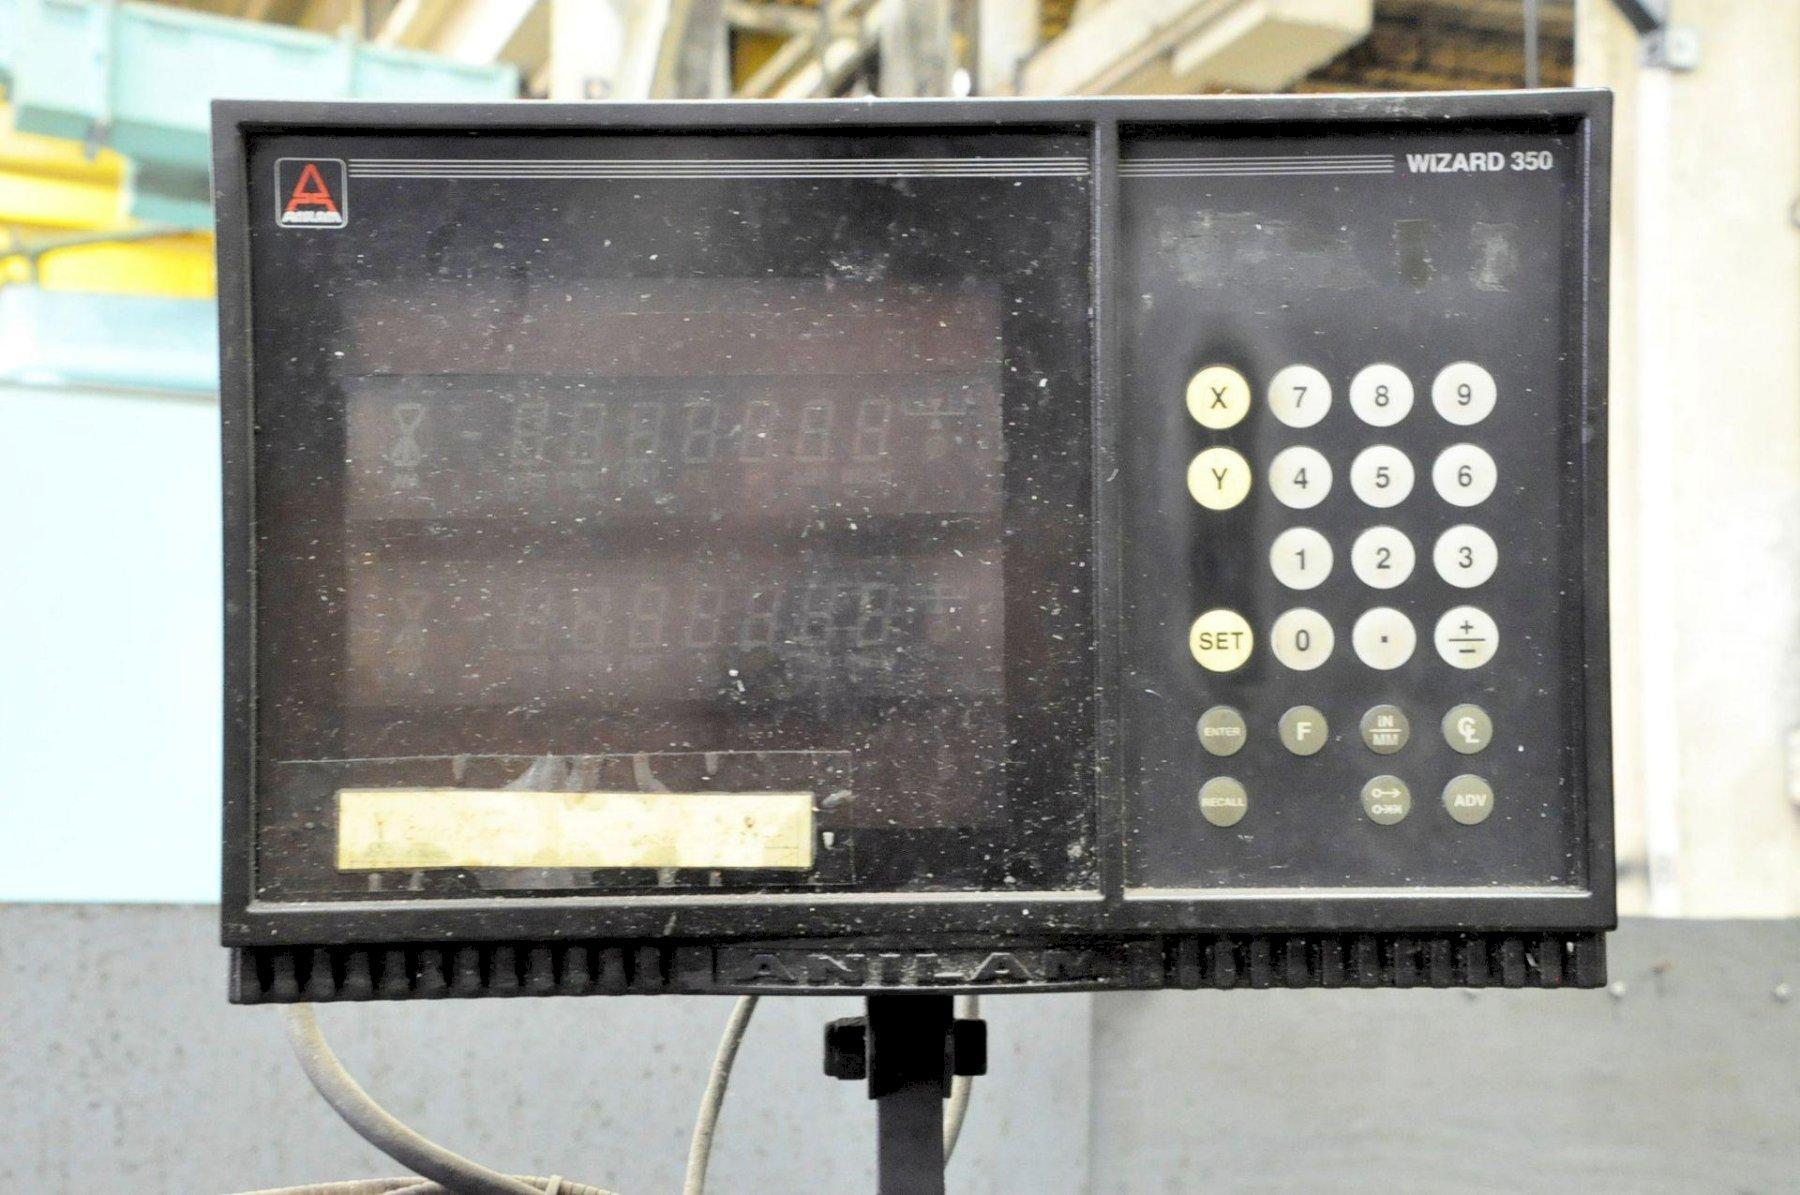 2 HP BRIDGEPORT SERIES I VERTICAL MILL